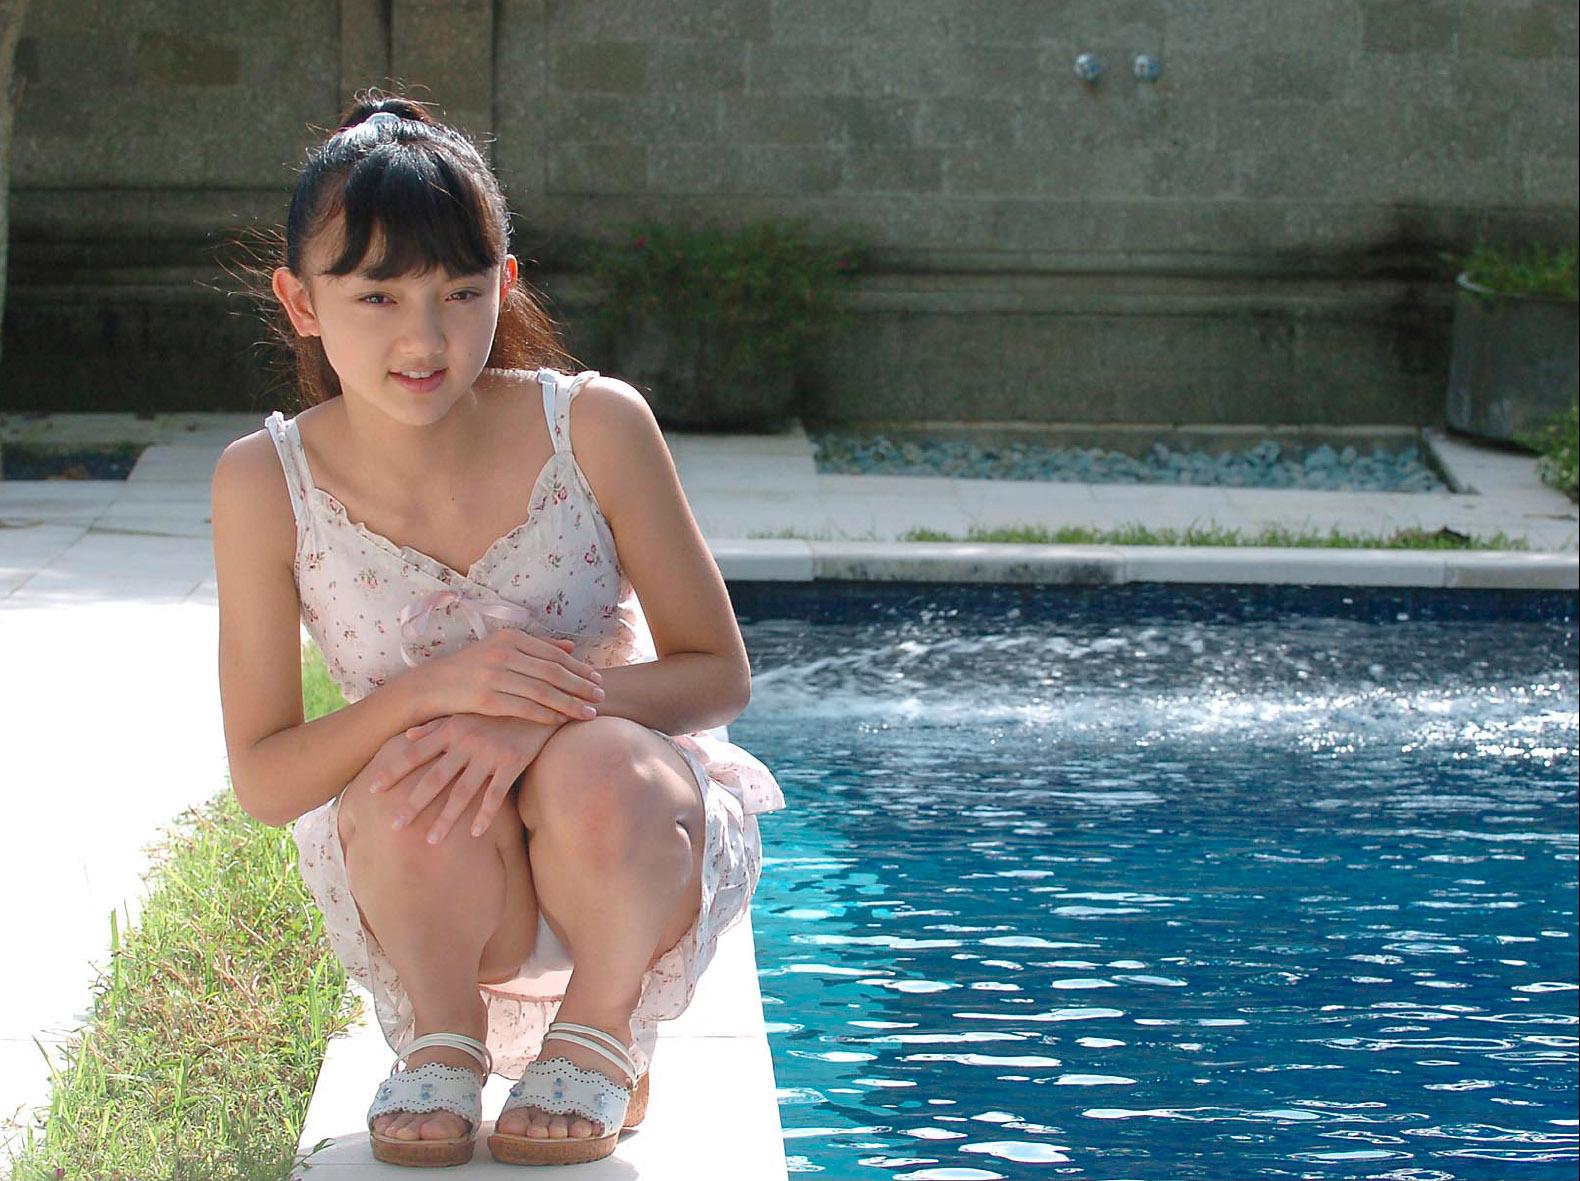 Azusa Hibino (日美野梓) 日美野梓 日比野梓 Azusa Hibino: Japanese Junior High SchoolGirl Free DVD & Photo  Book